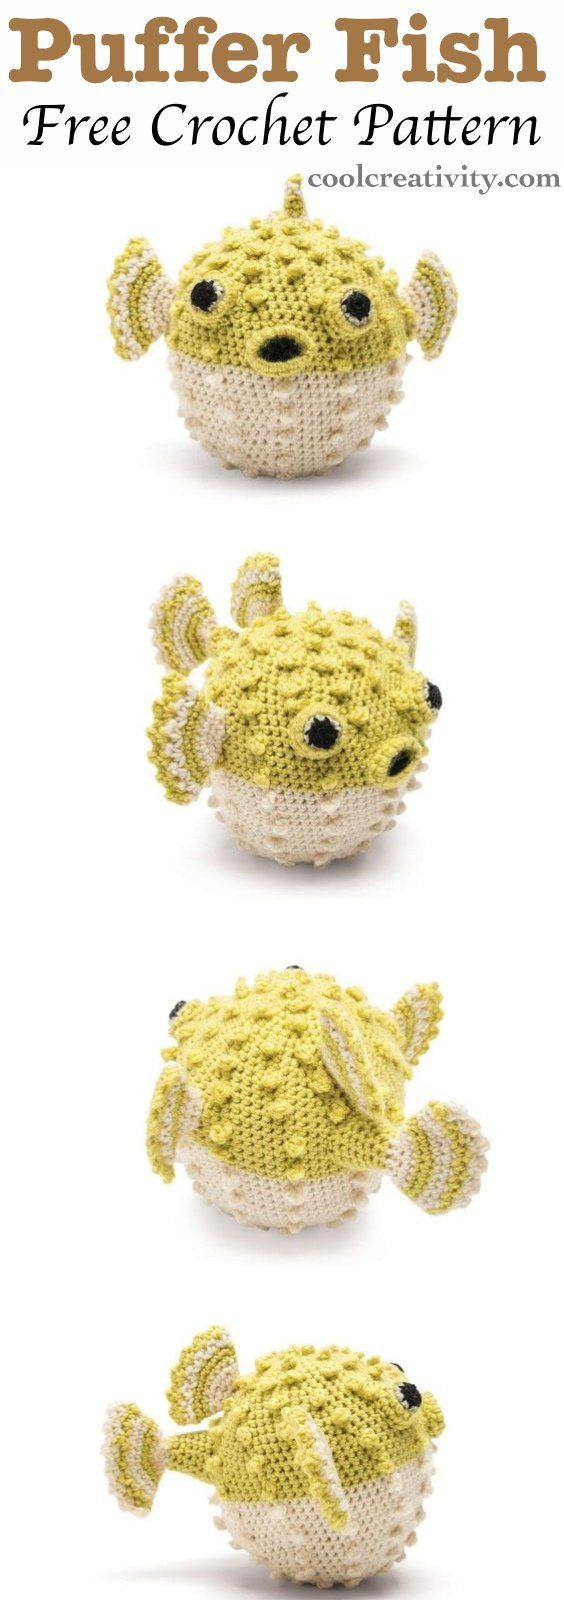 Crochet Cute Amigurumi Puffer Fish with Free Pattern | Tejido